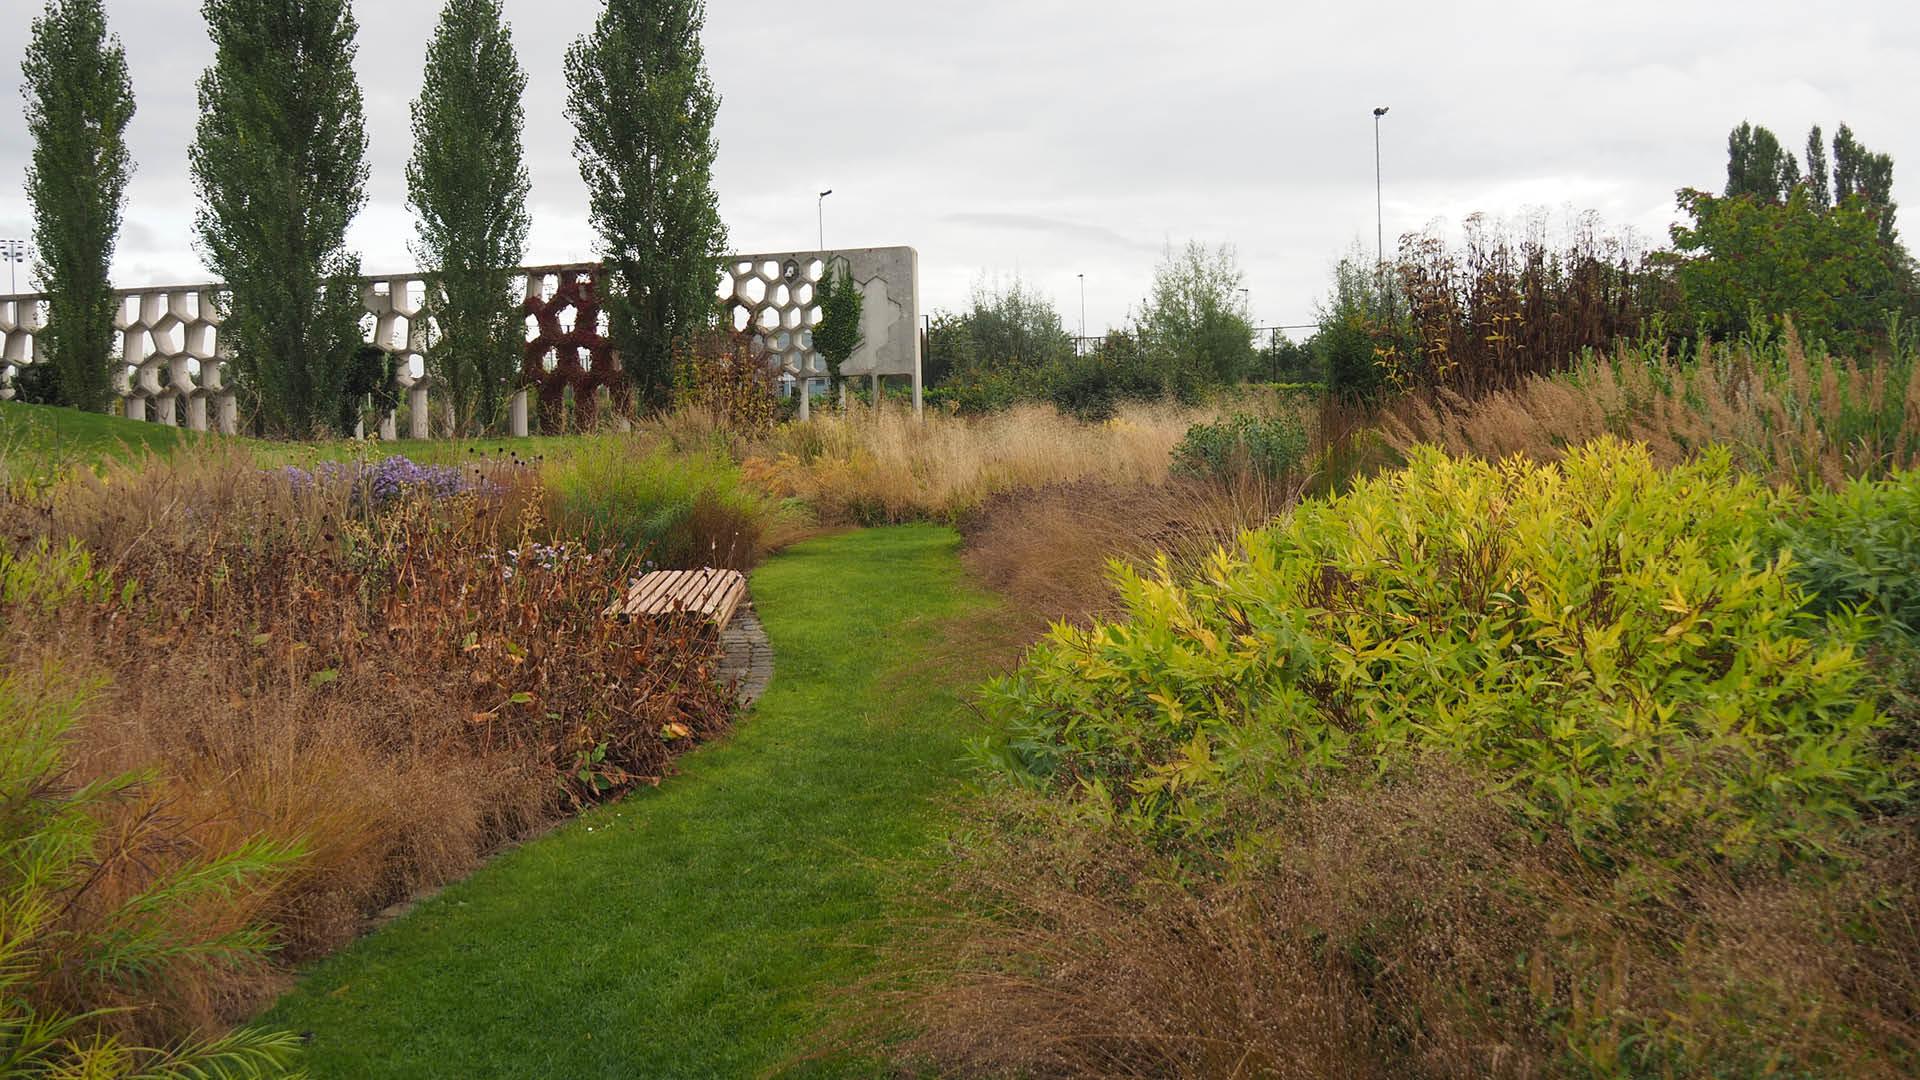 Maxima Park, Maastricht